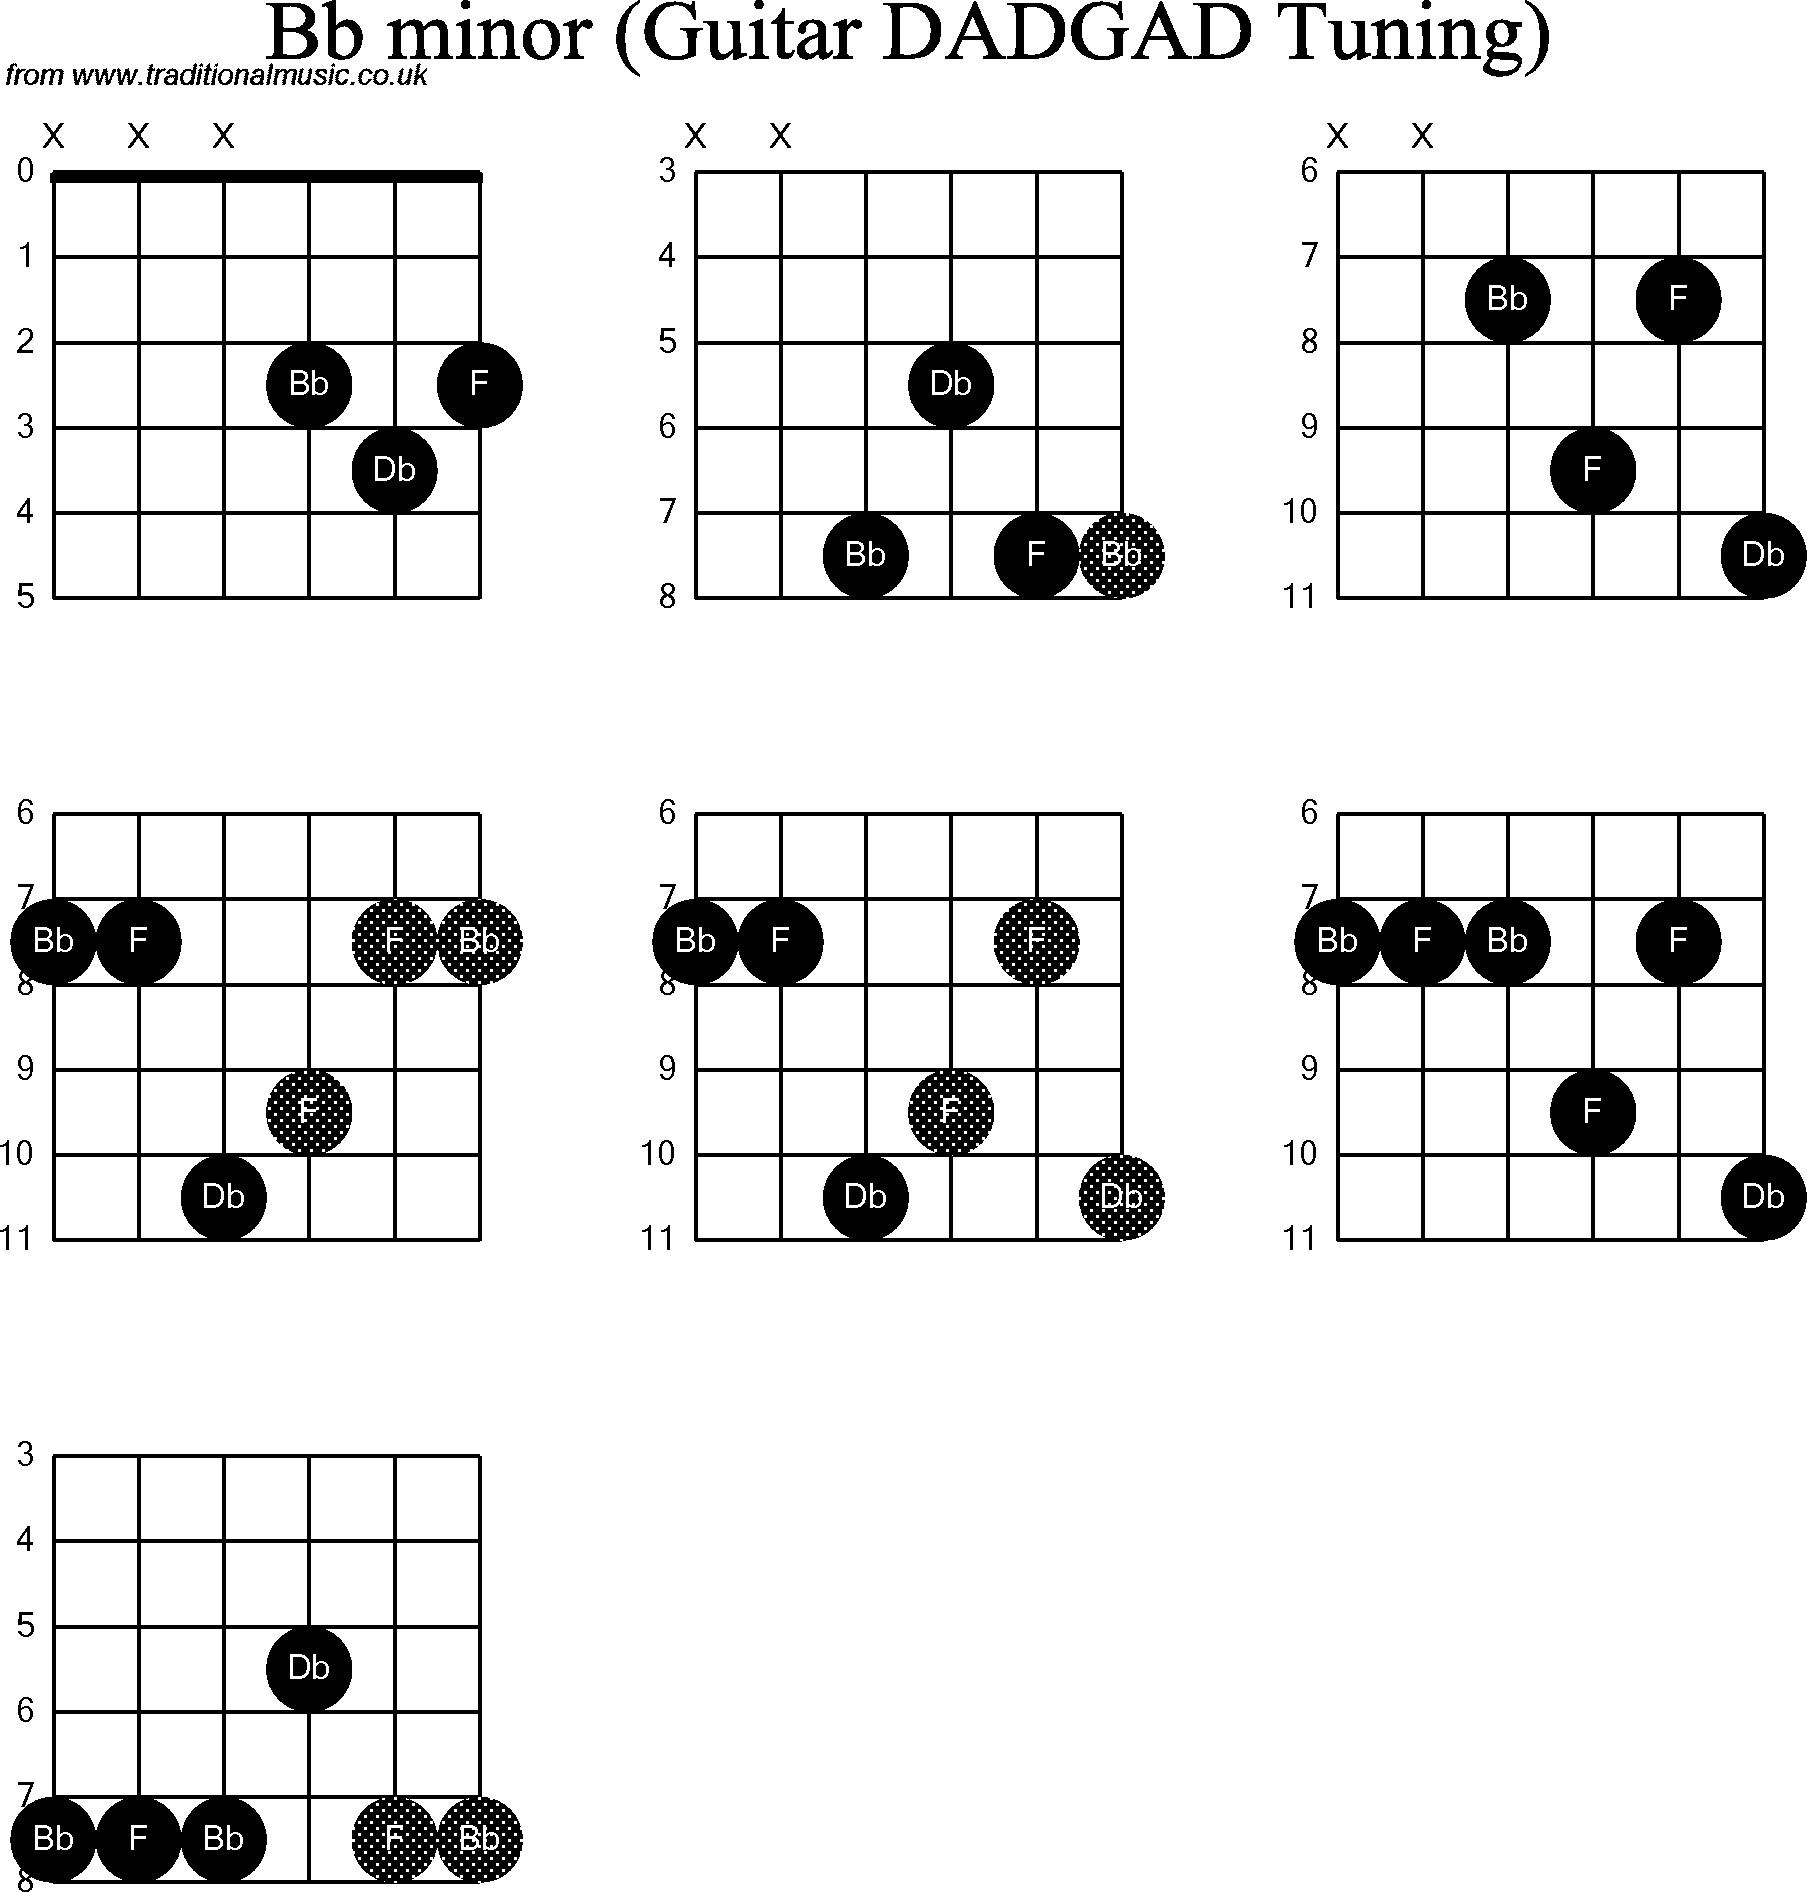 B Minor Guitar Chord Chord Diagrams For Dobro Bb Minor Wiring Diagrams Dash